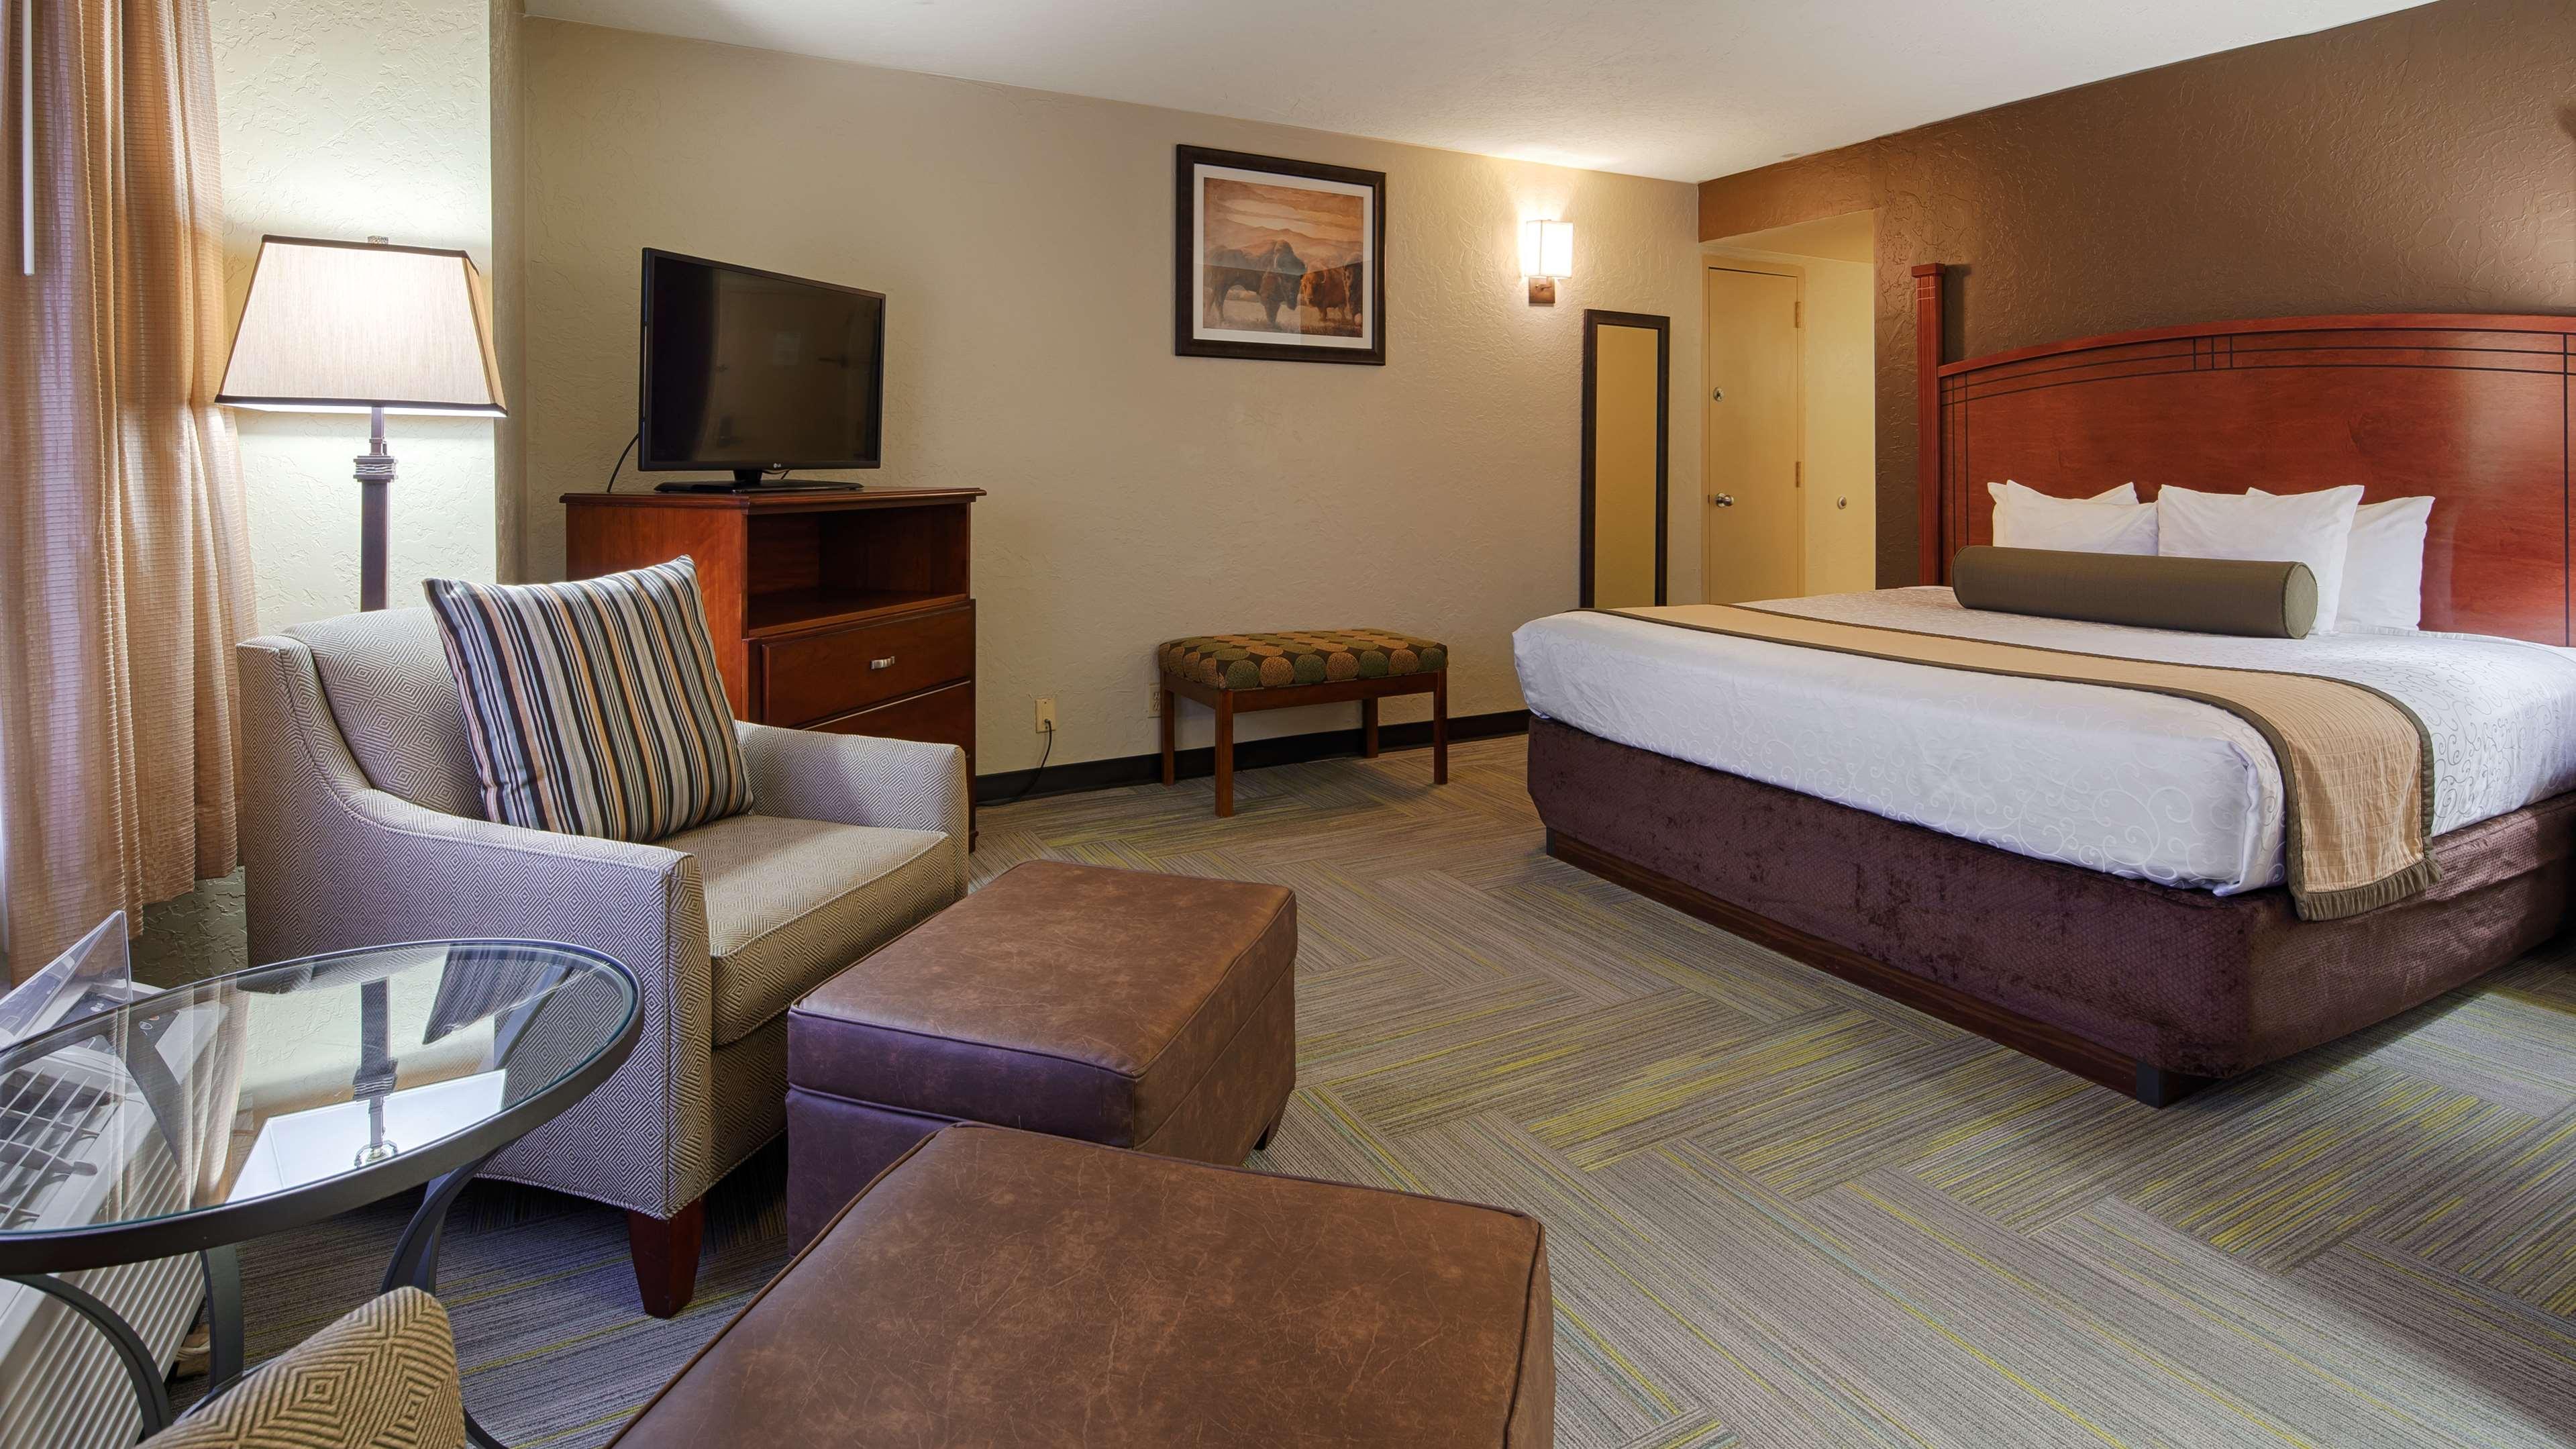 Best Western Plus Lawton Hotel & Convention Center image 11